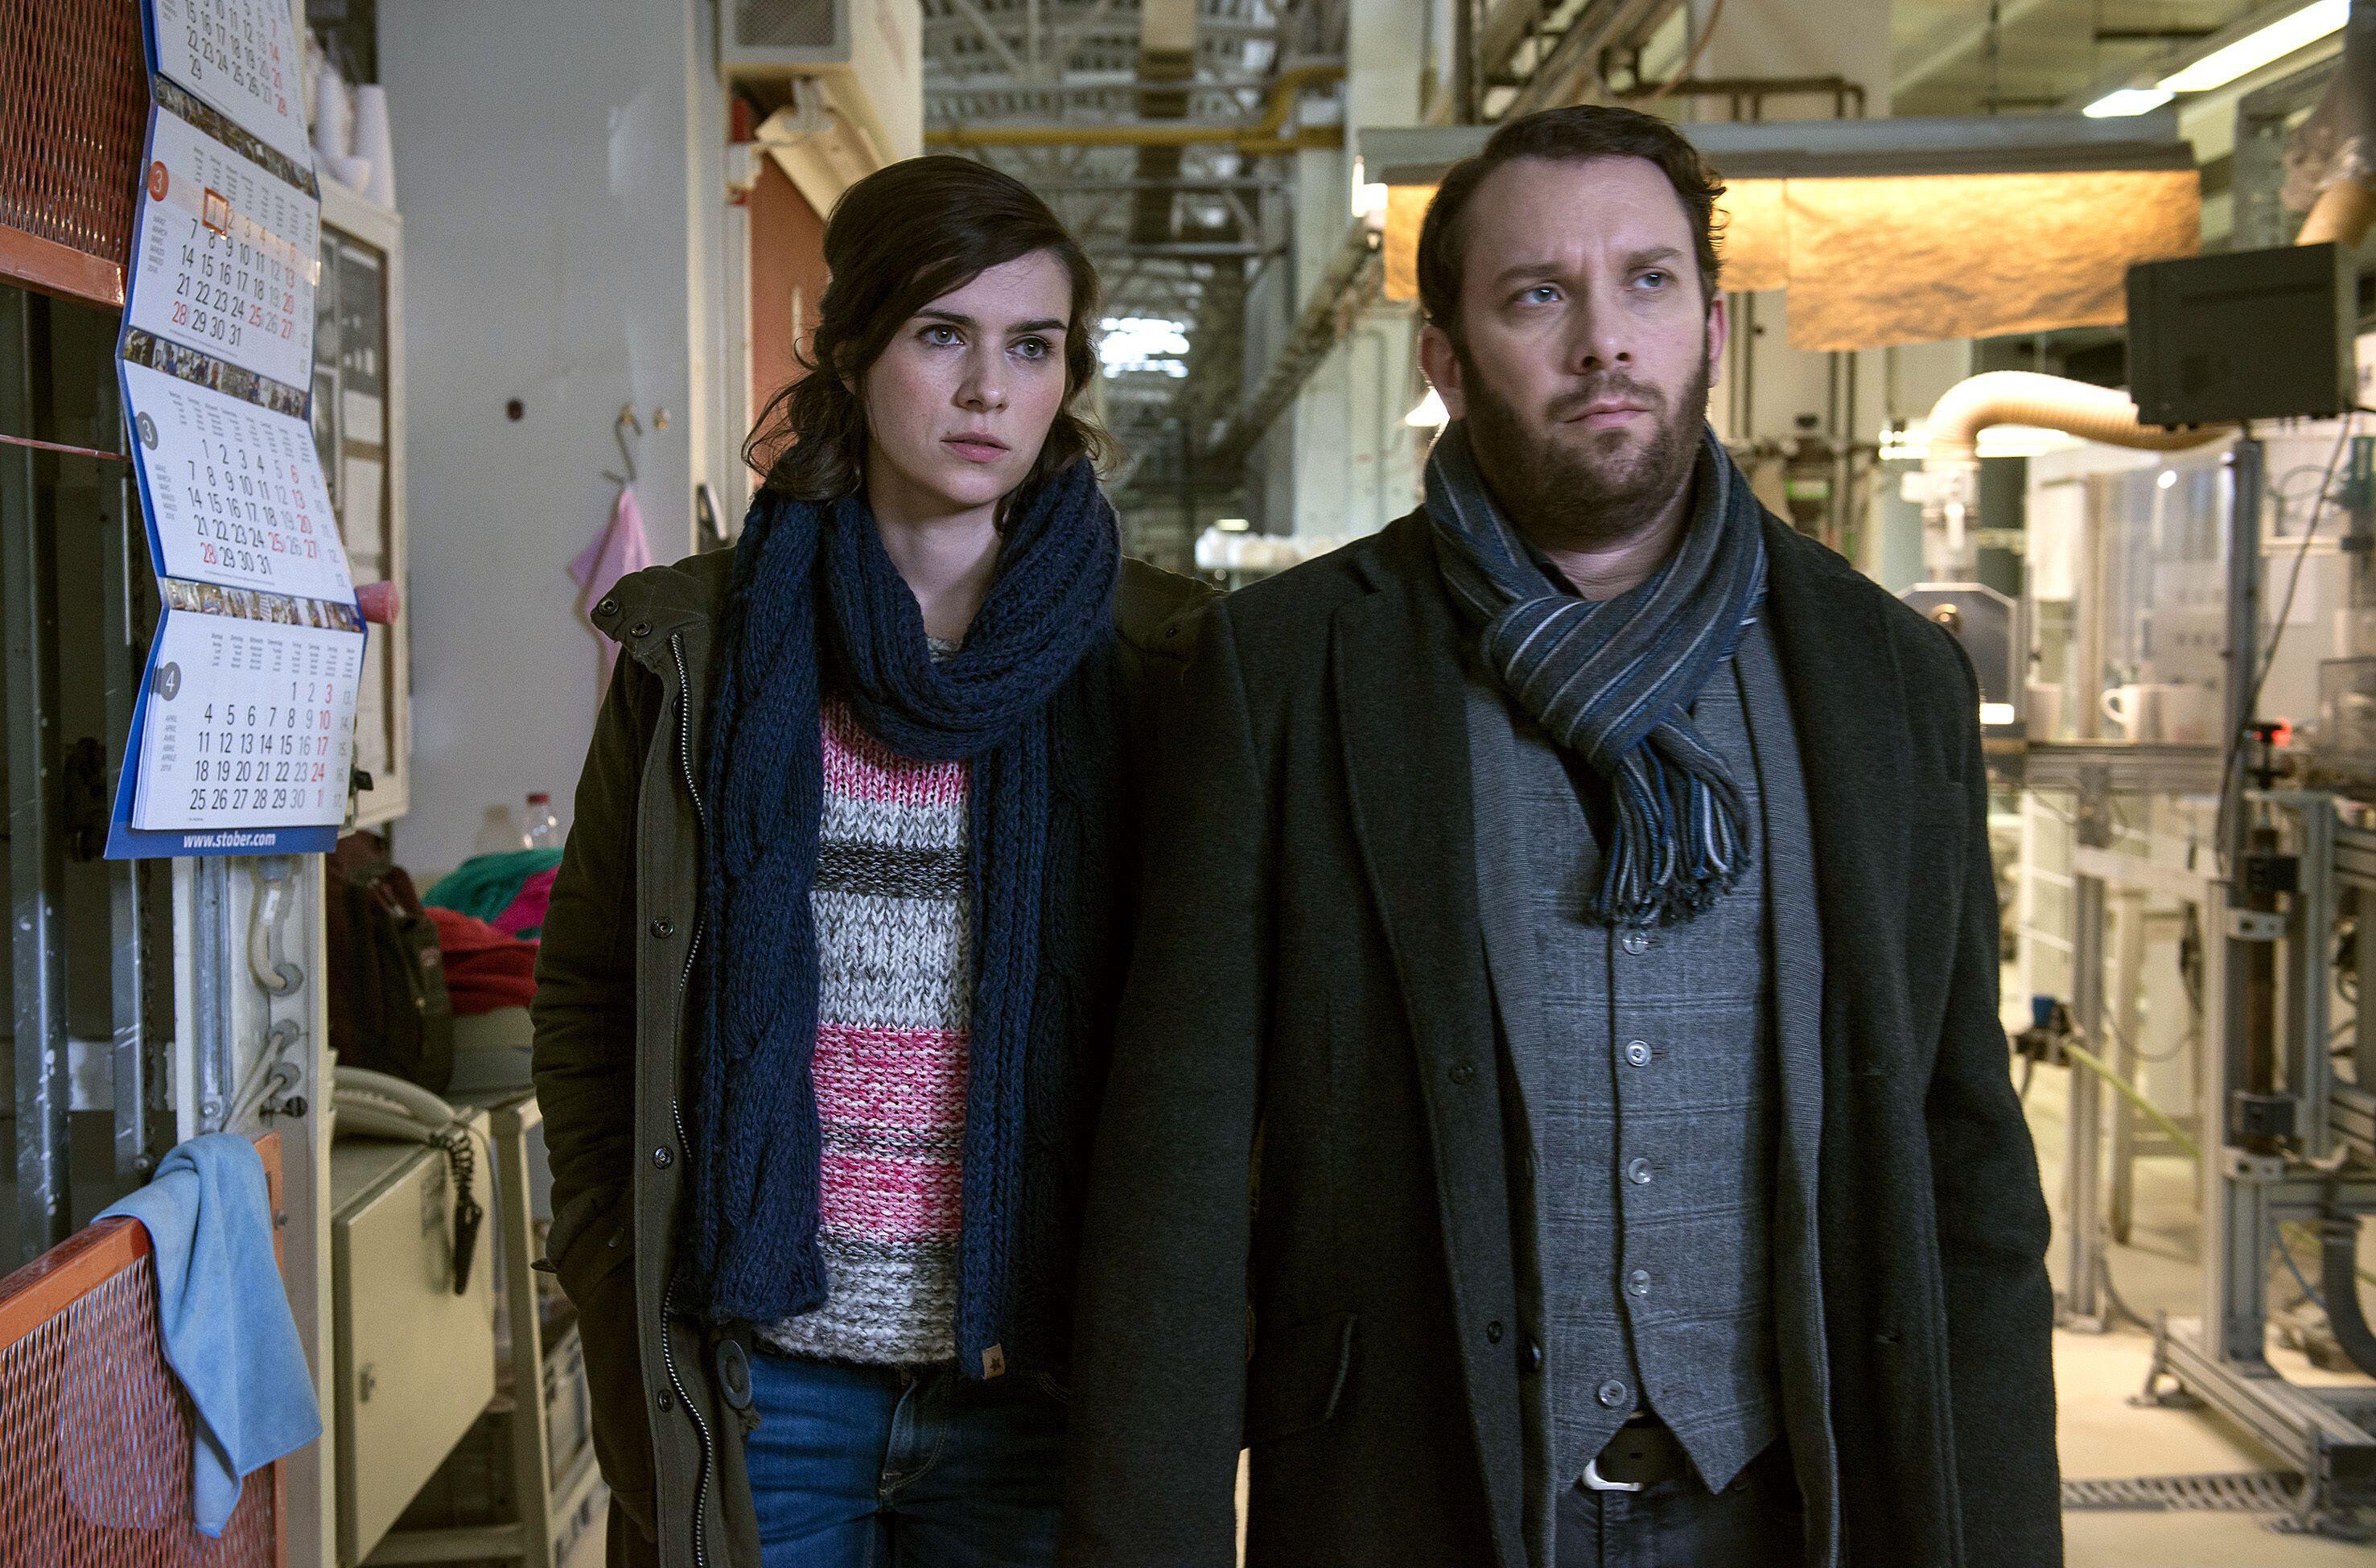 Bild zu Tatort, Nora Tschirner, Christian Ulmen